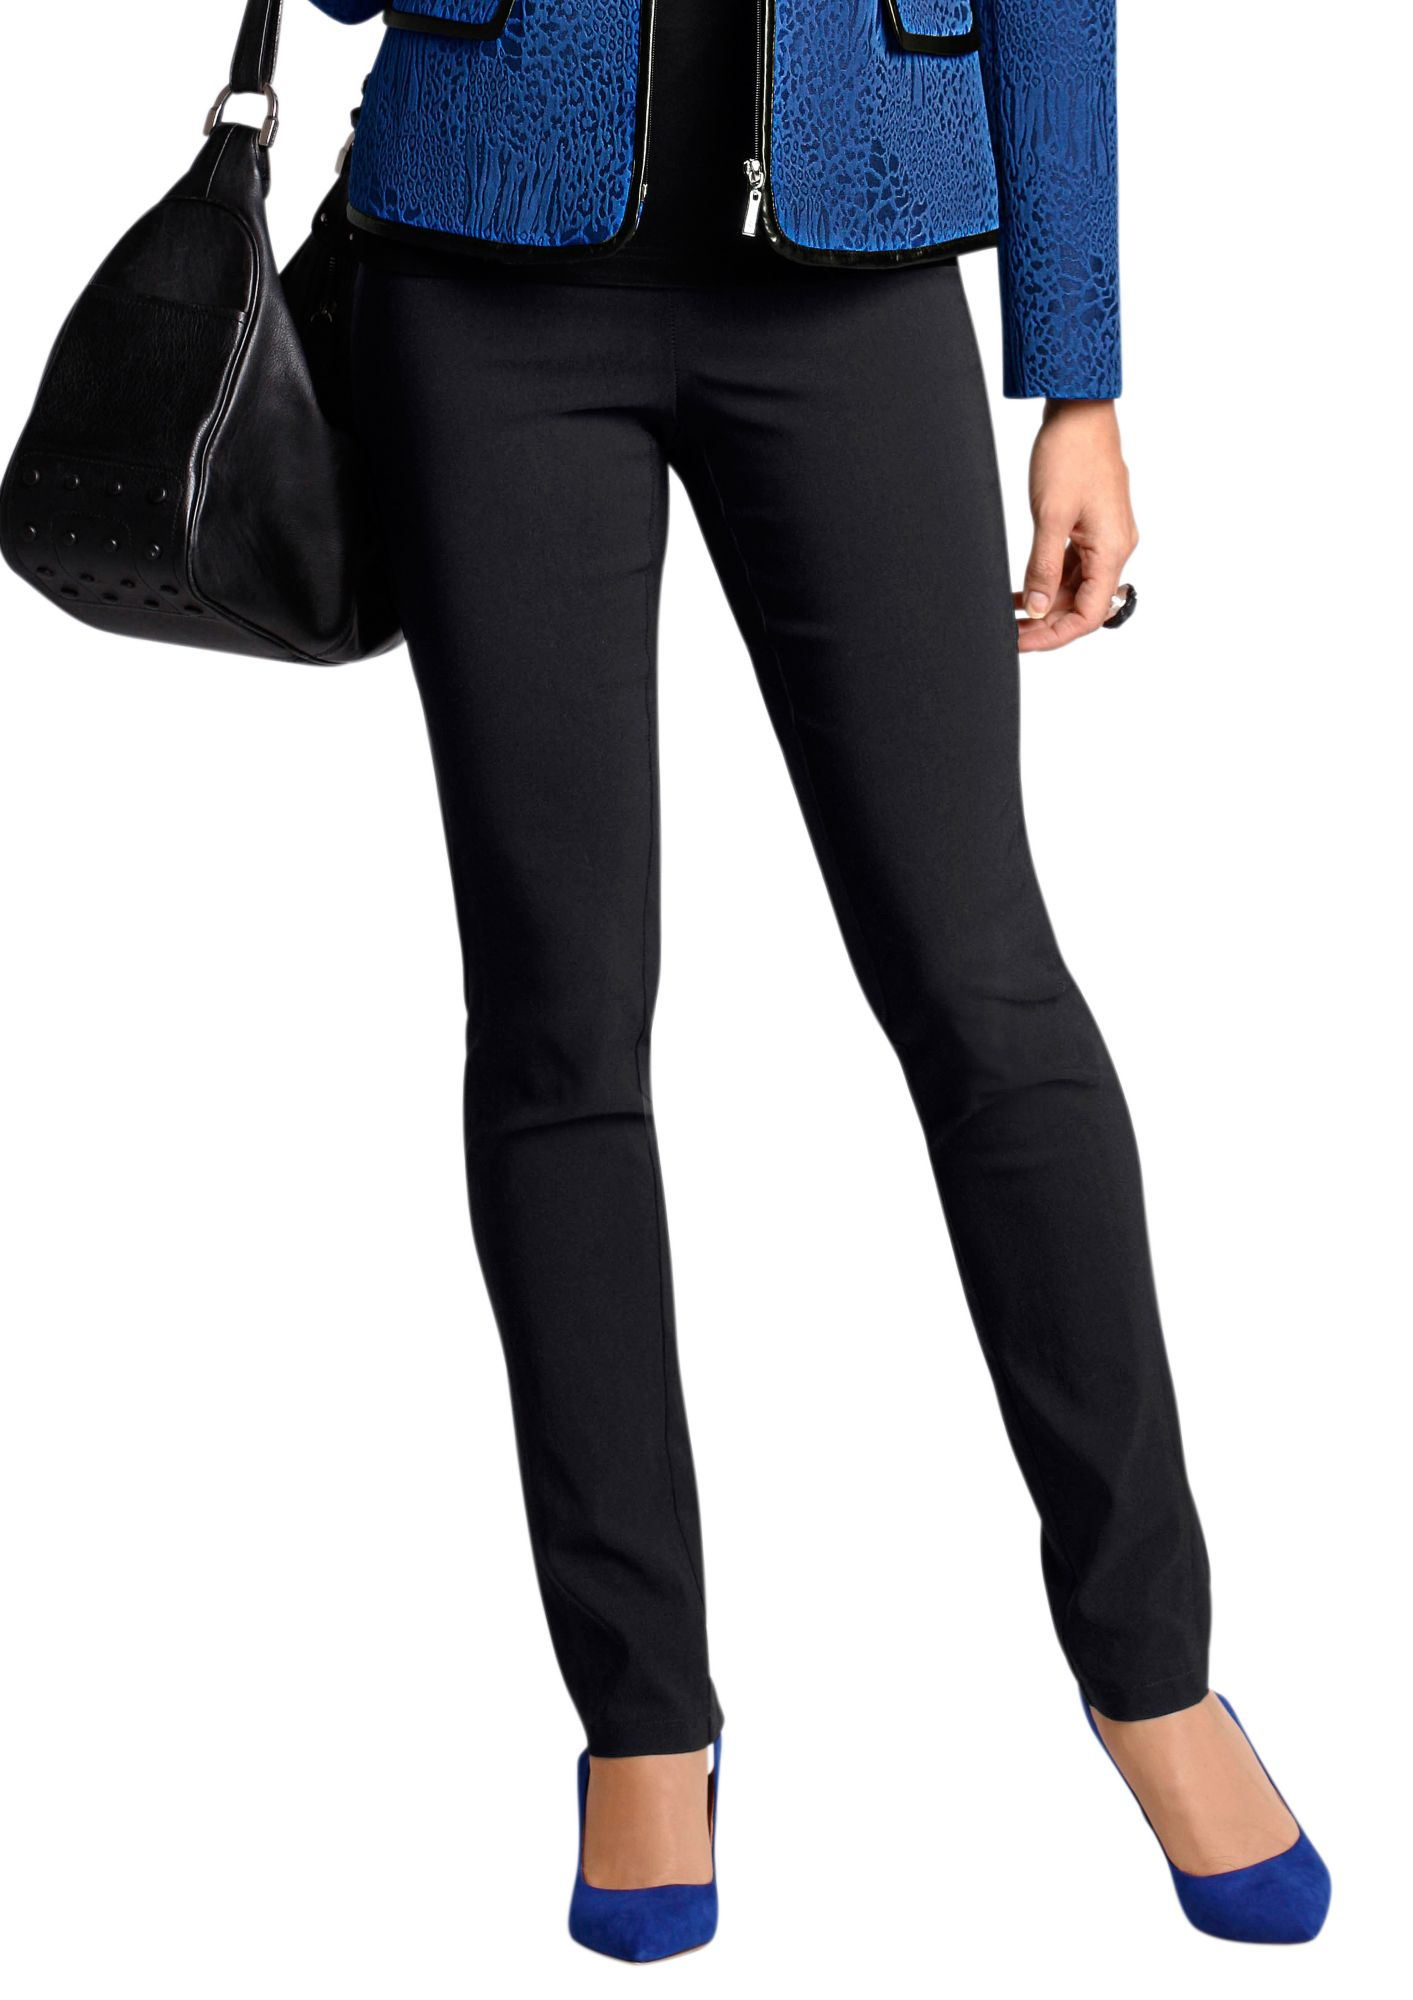 ASCARI Ascari Hose - perfekte Ergänzung zur aktuellen Mode